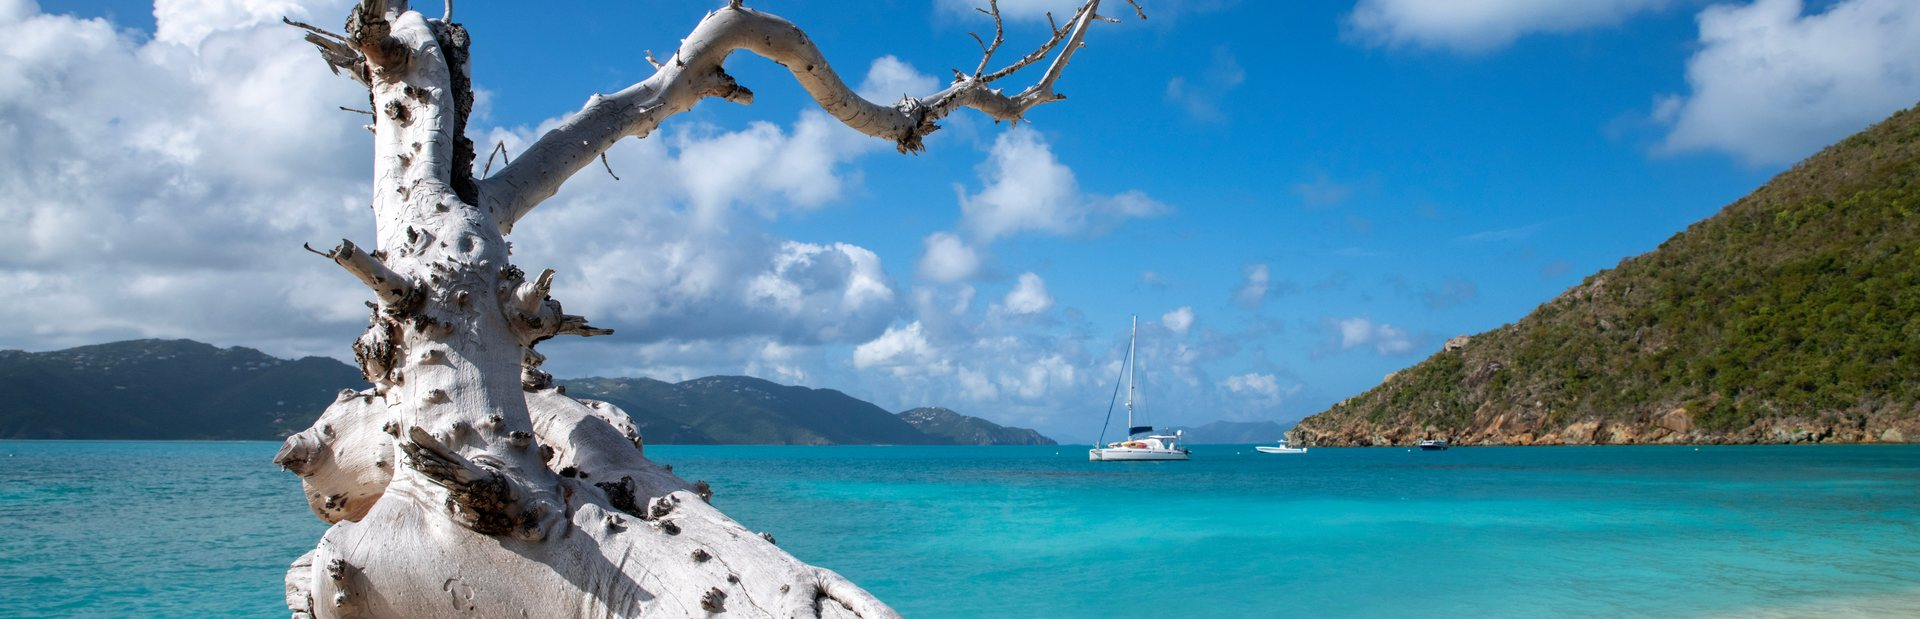 British Virgin Islands climate photo